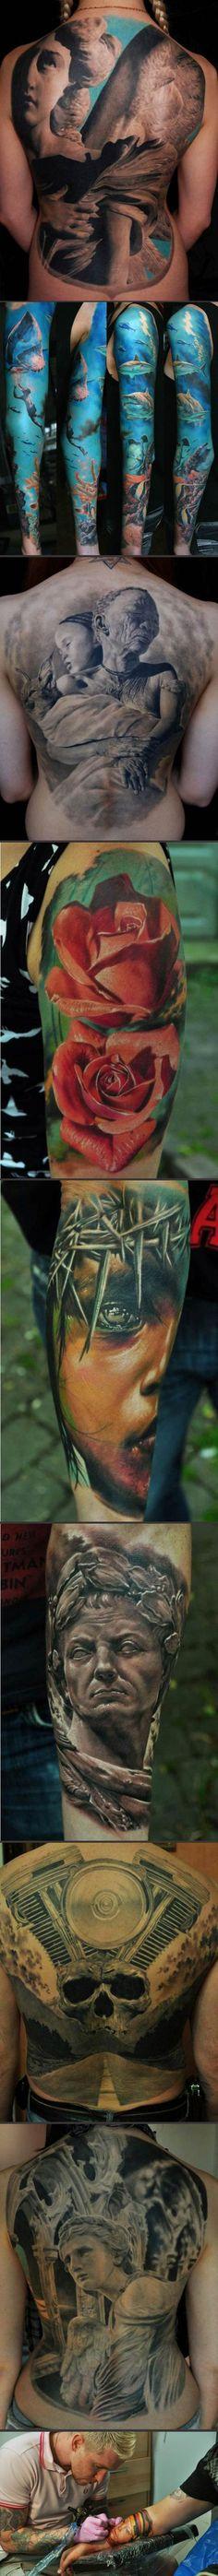 Some amazing tattoos